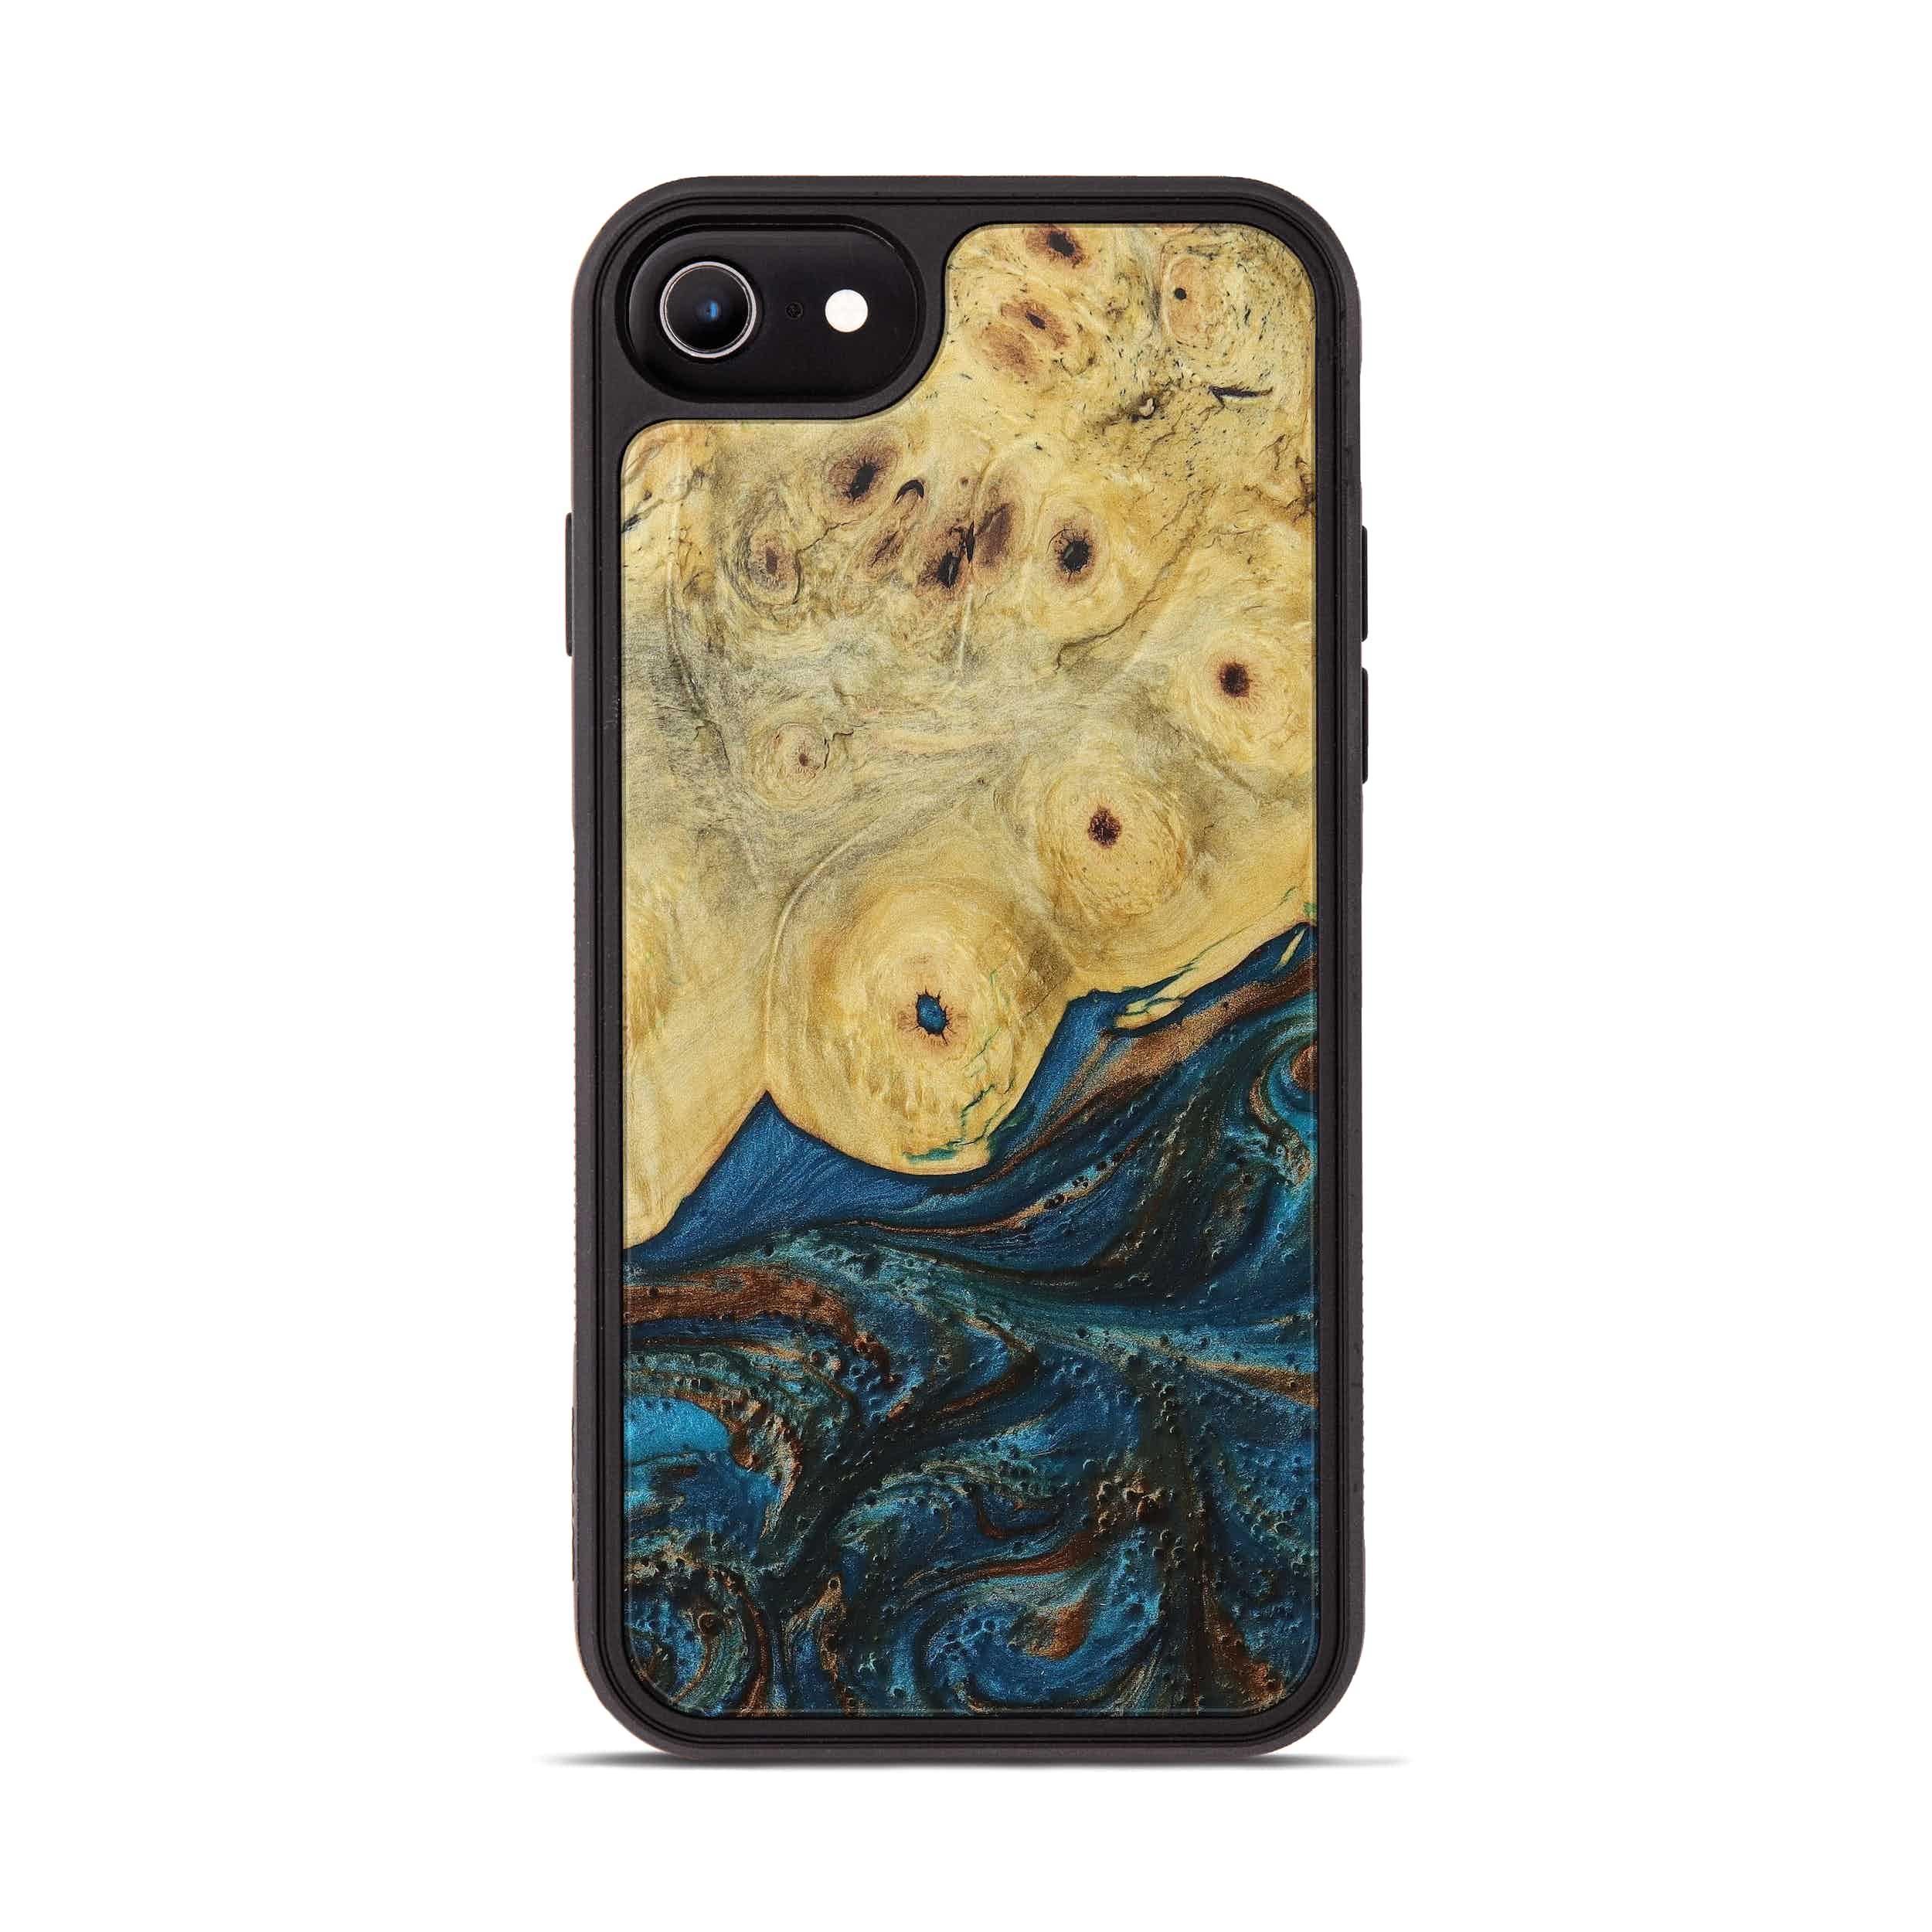 iPhone 8 Wood+Resin Phone Case - Mats (Teal & Gold, 394367)